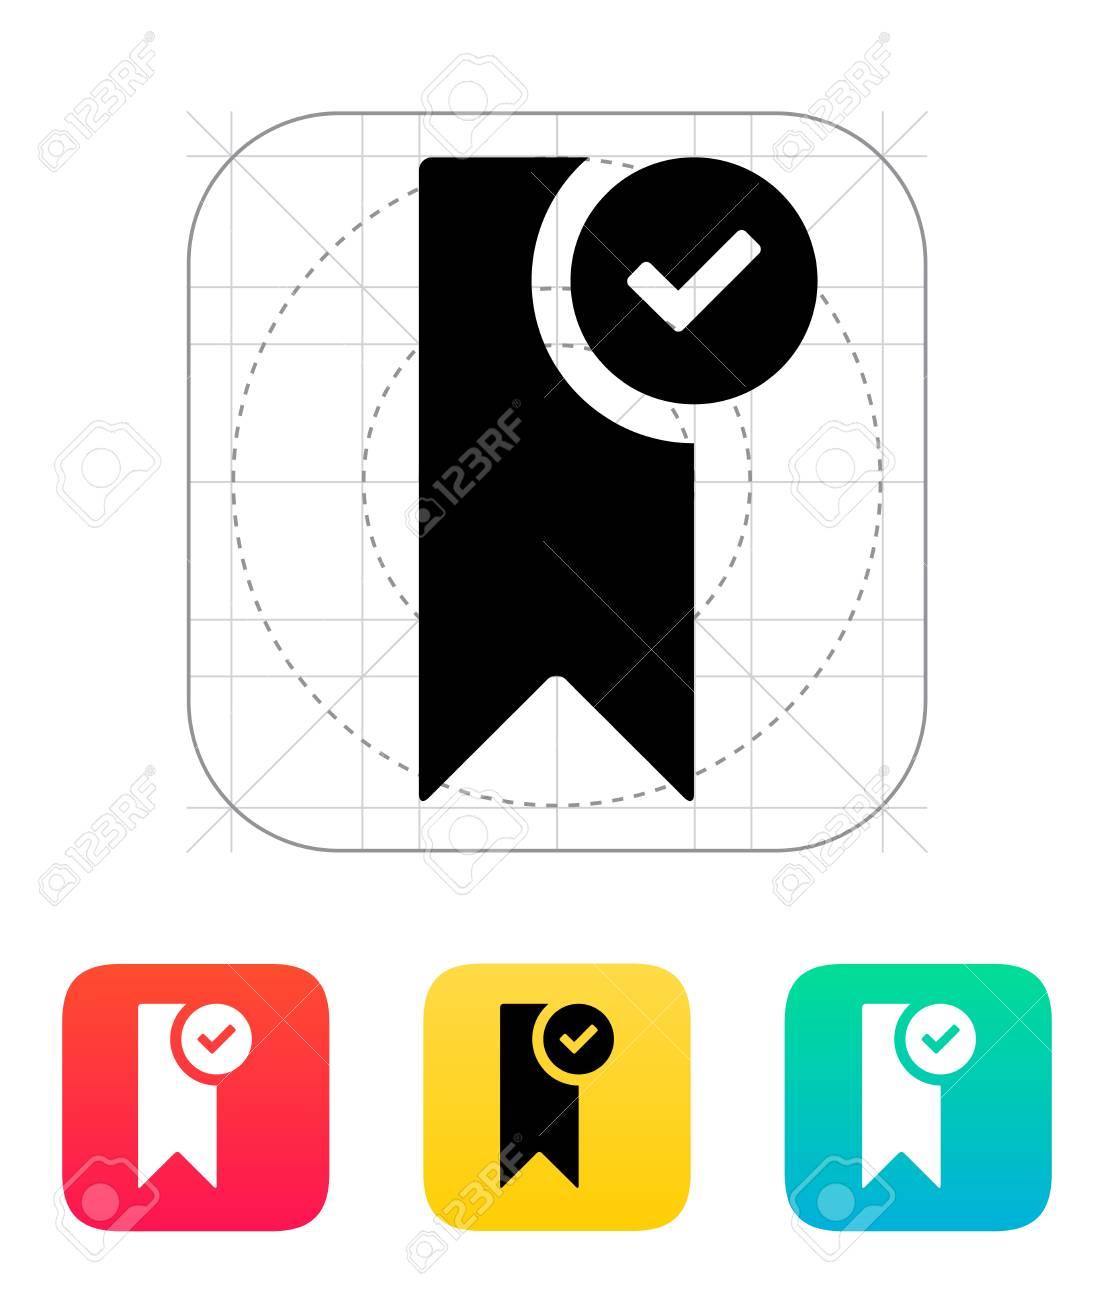 Check bookmark icon. Vector illustration. Stock Vector - 25211350